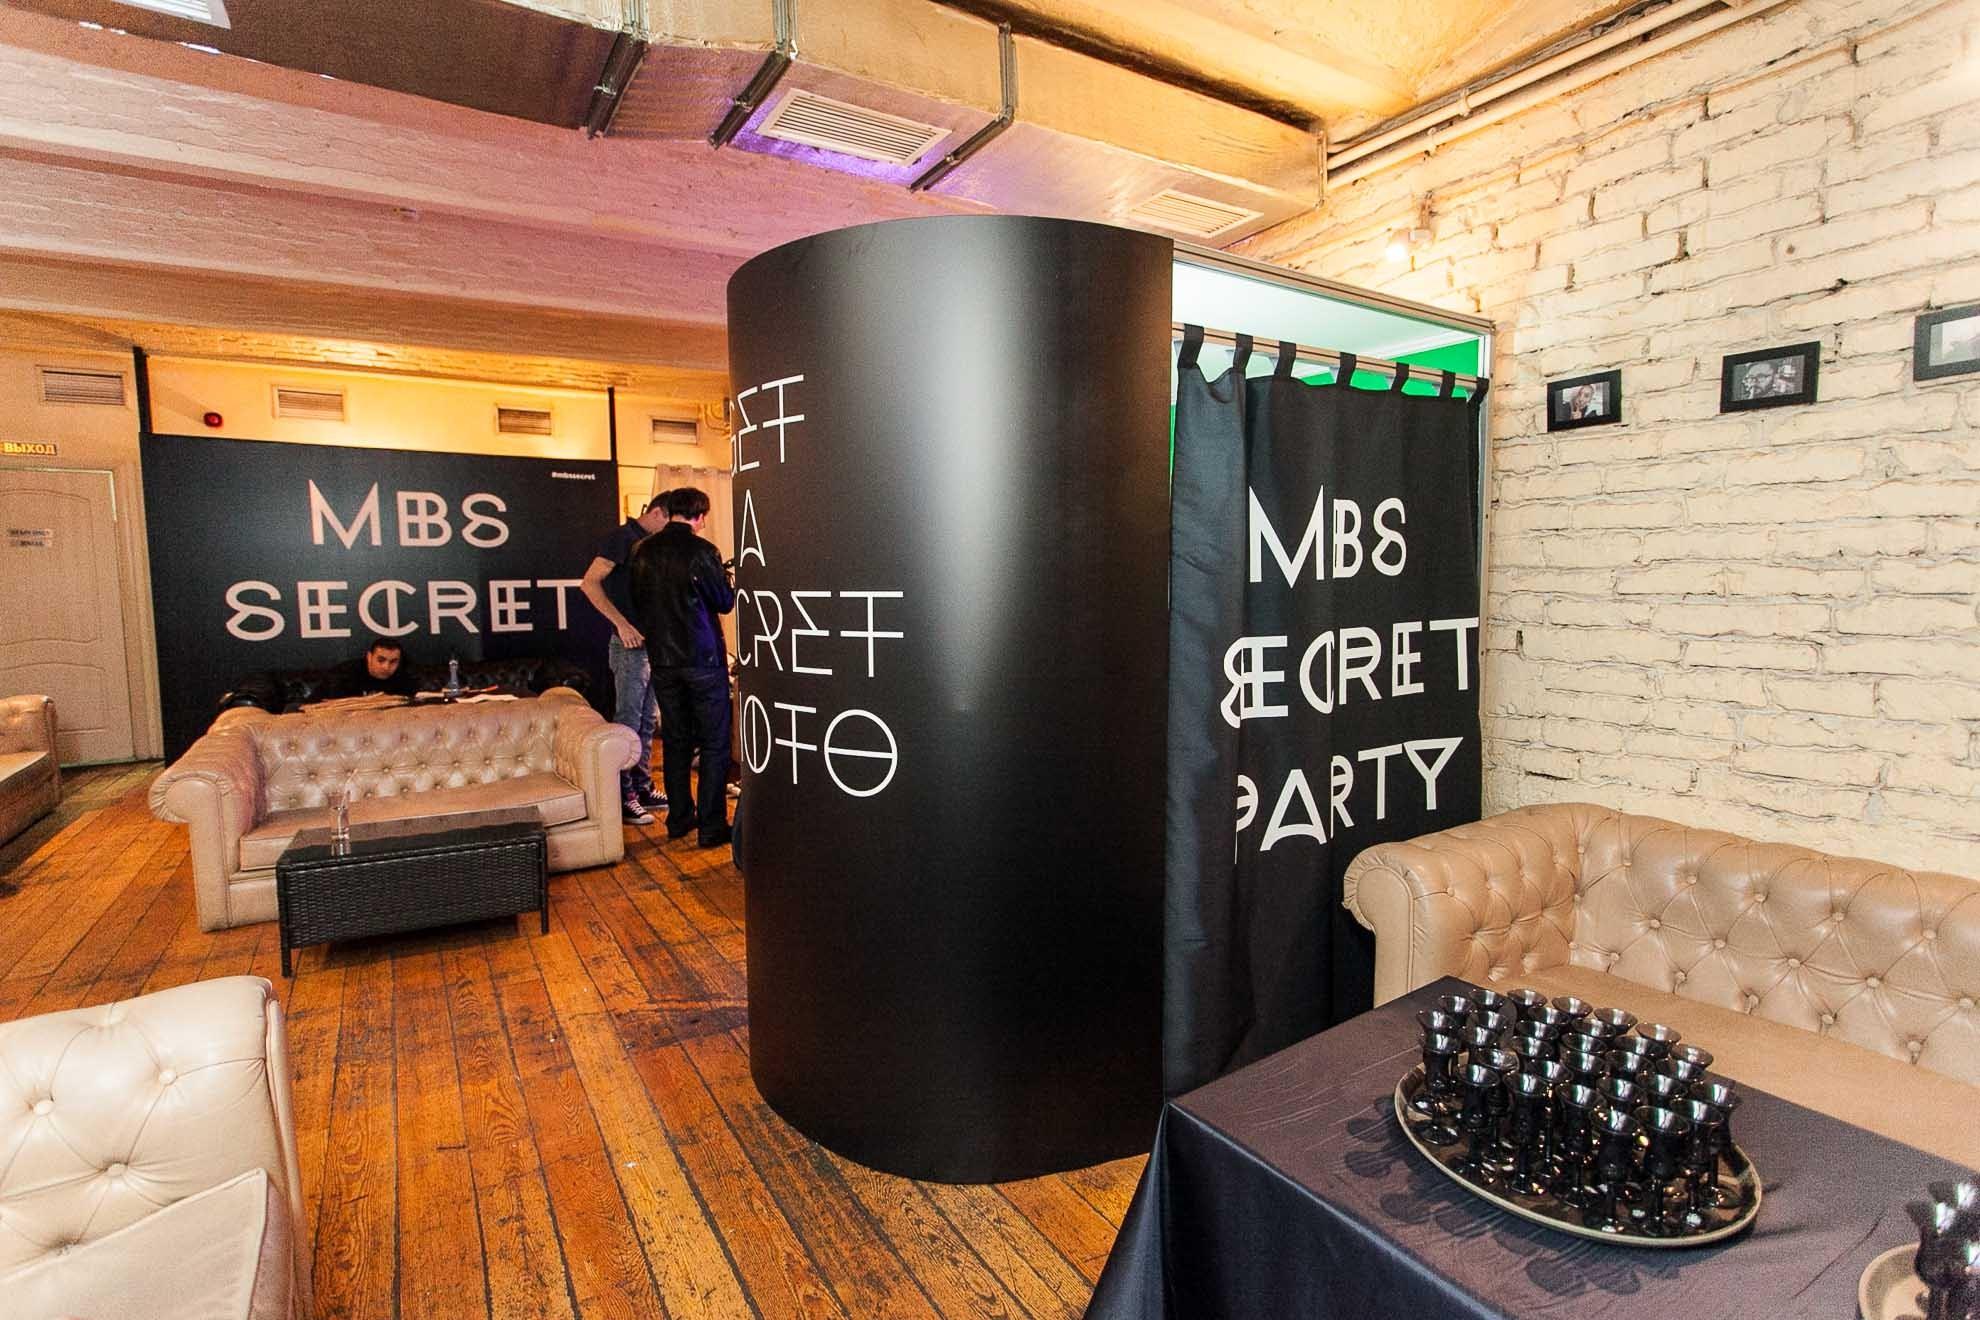 ДЛЯ MBS SECRET PARTY